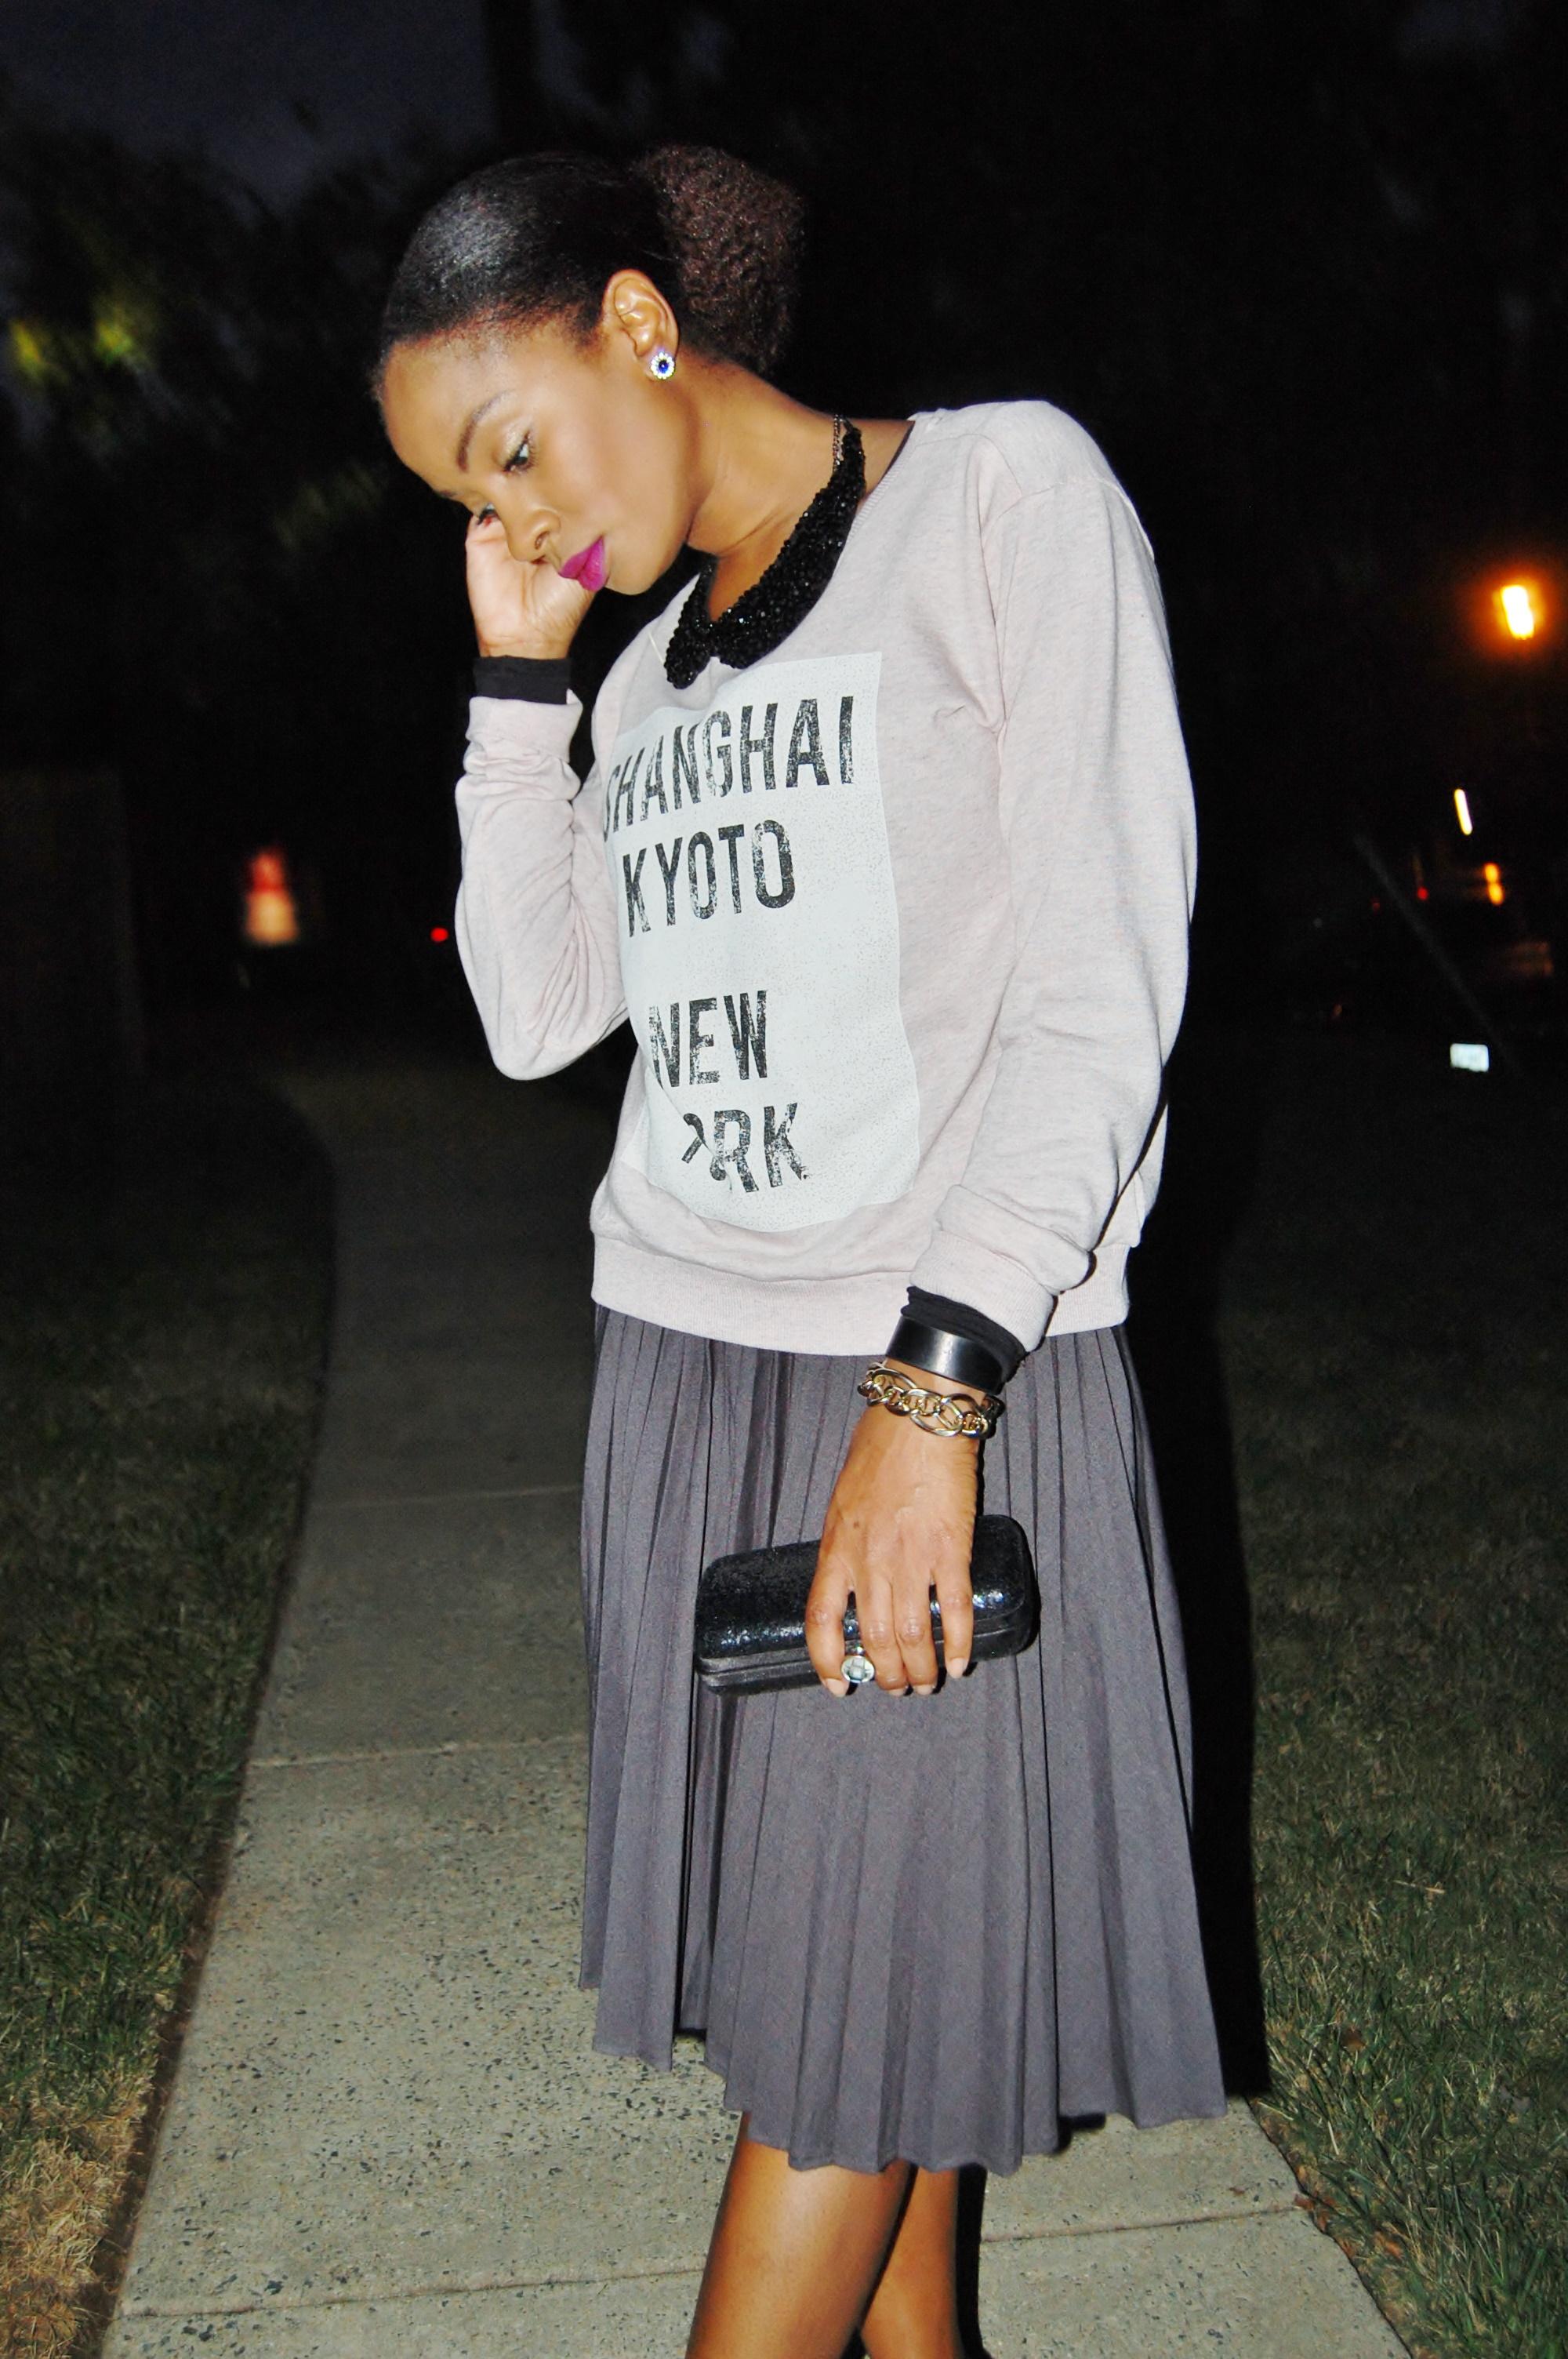 Yana B. Graphic sweatshirt with grey pleated skirt